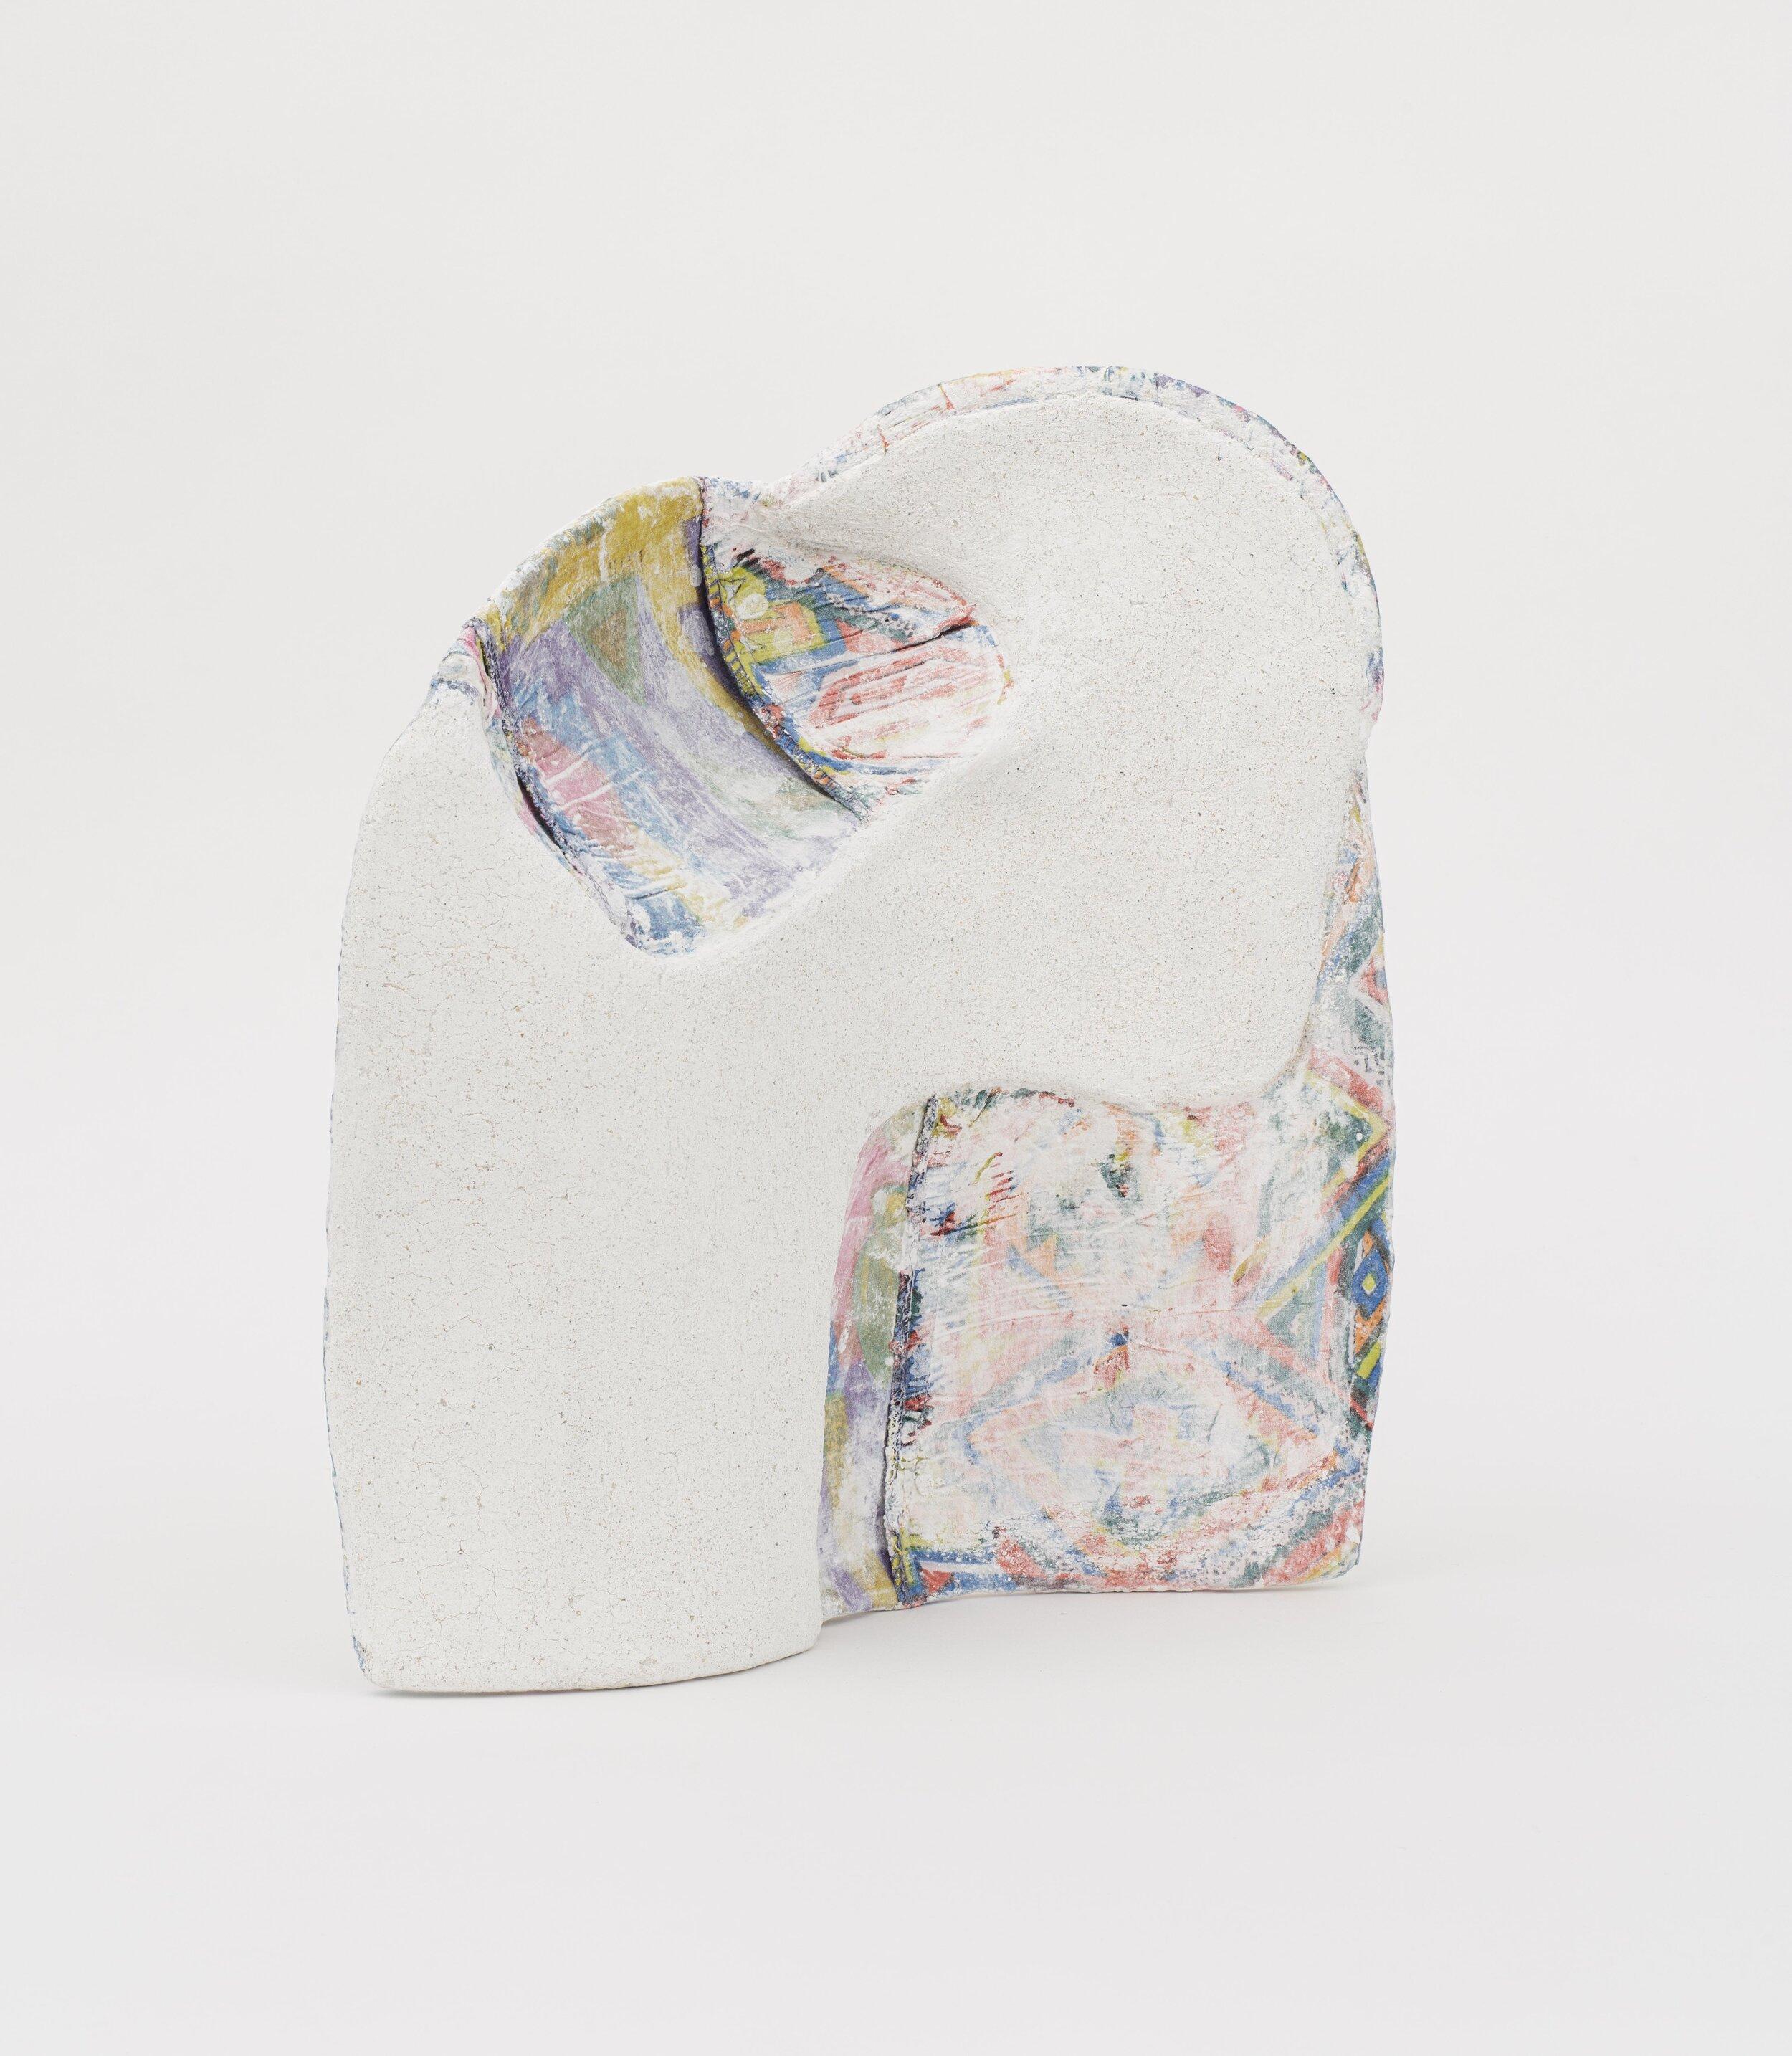 Jennifer Paige Cohen,  Untitled,  2019. Dress, plaster, lime plaster, CelluClay. 12.5 x 10.5 x 6 inches. 31.8 x 26.7 x 15.2 cm.